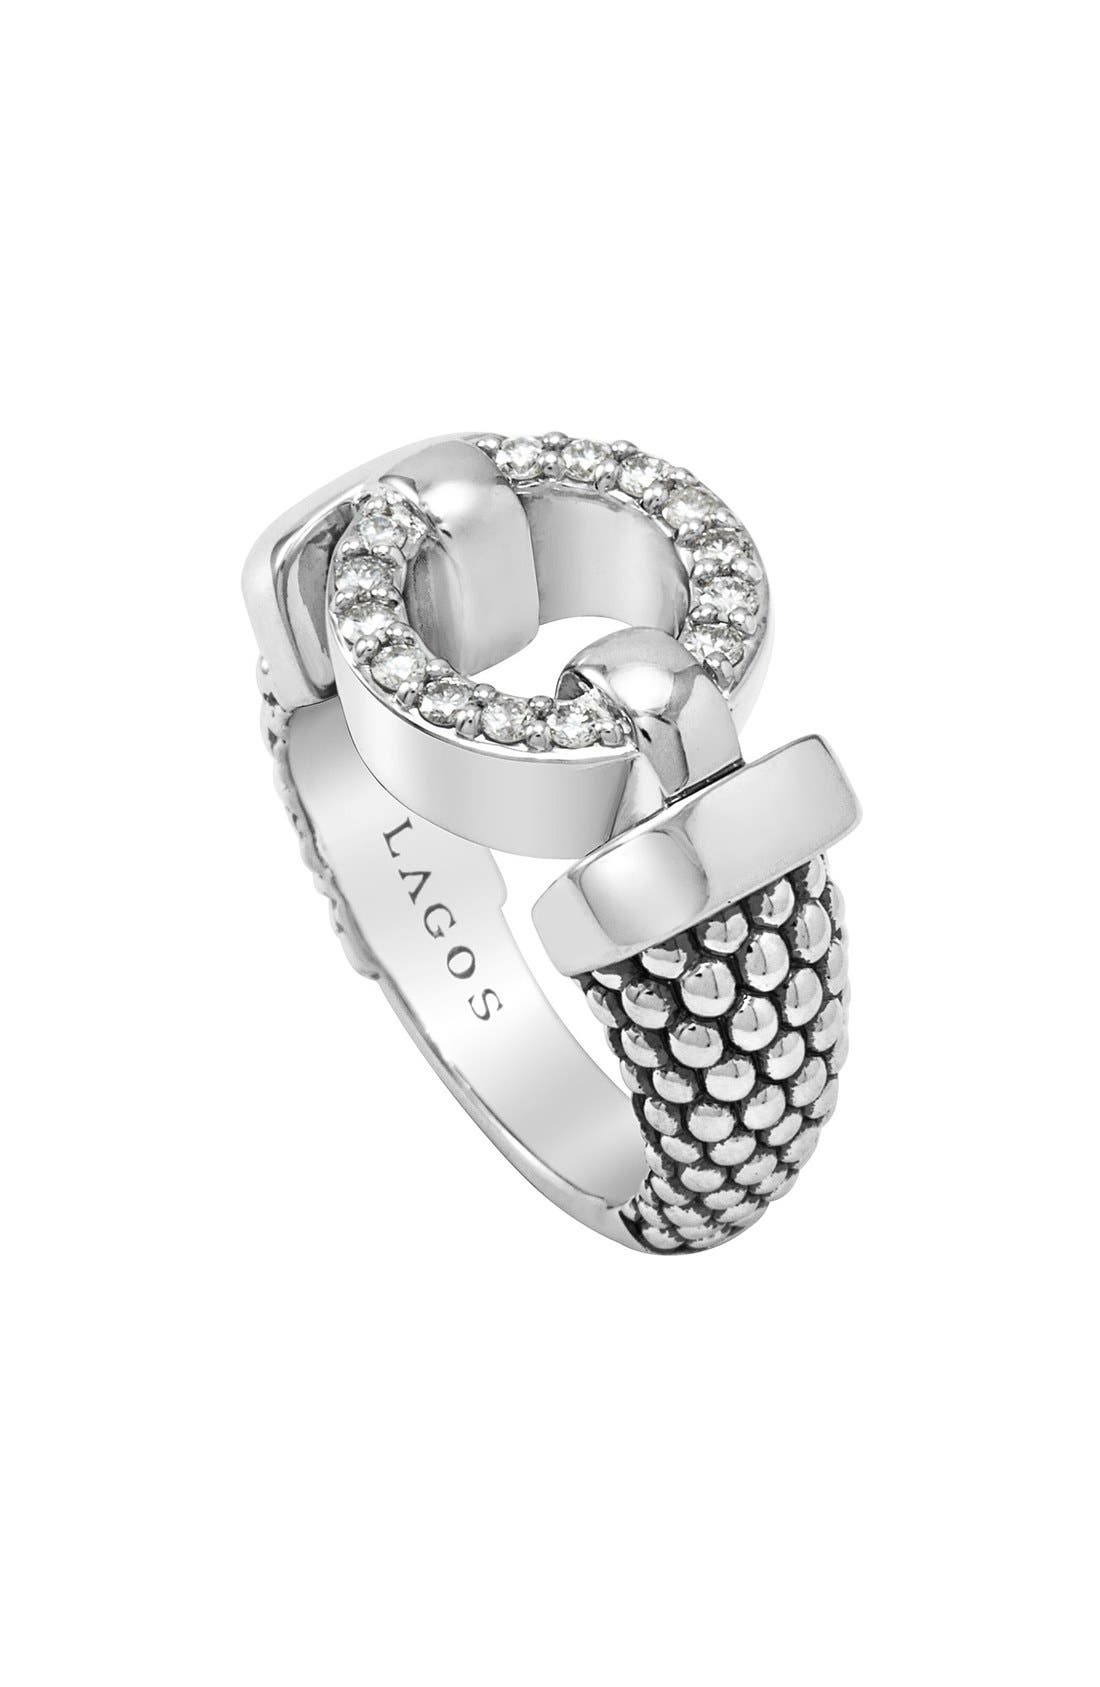 'Enso - Circle Game' Diamond Caviar Ring,                         Main,                         color, Silver